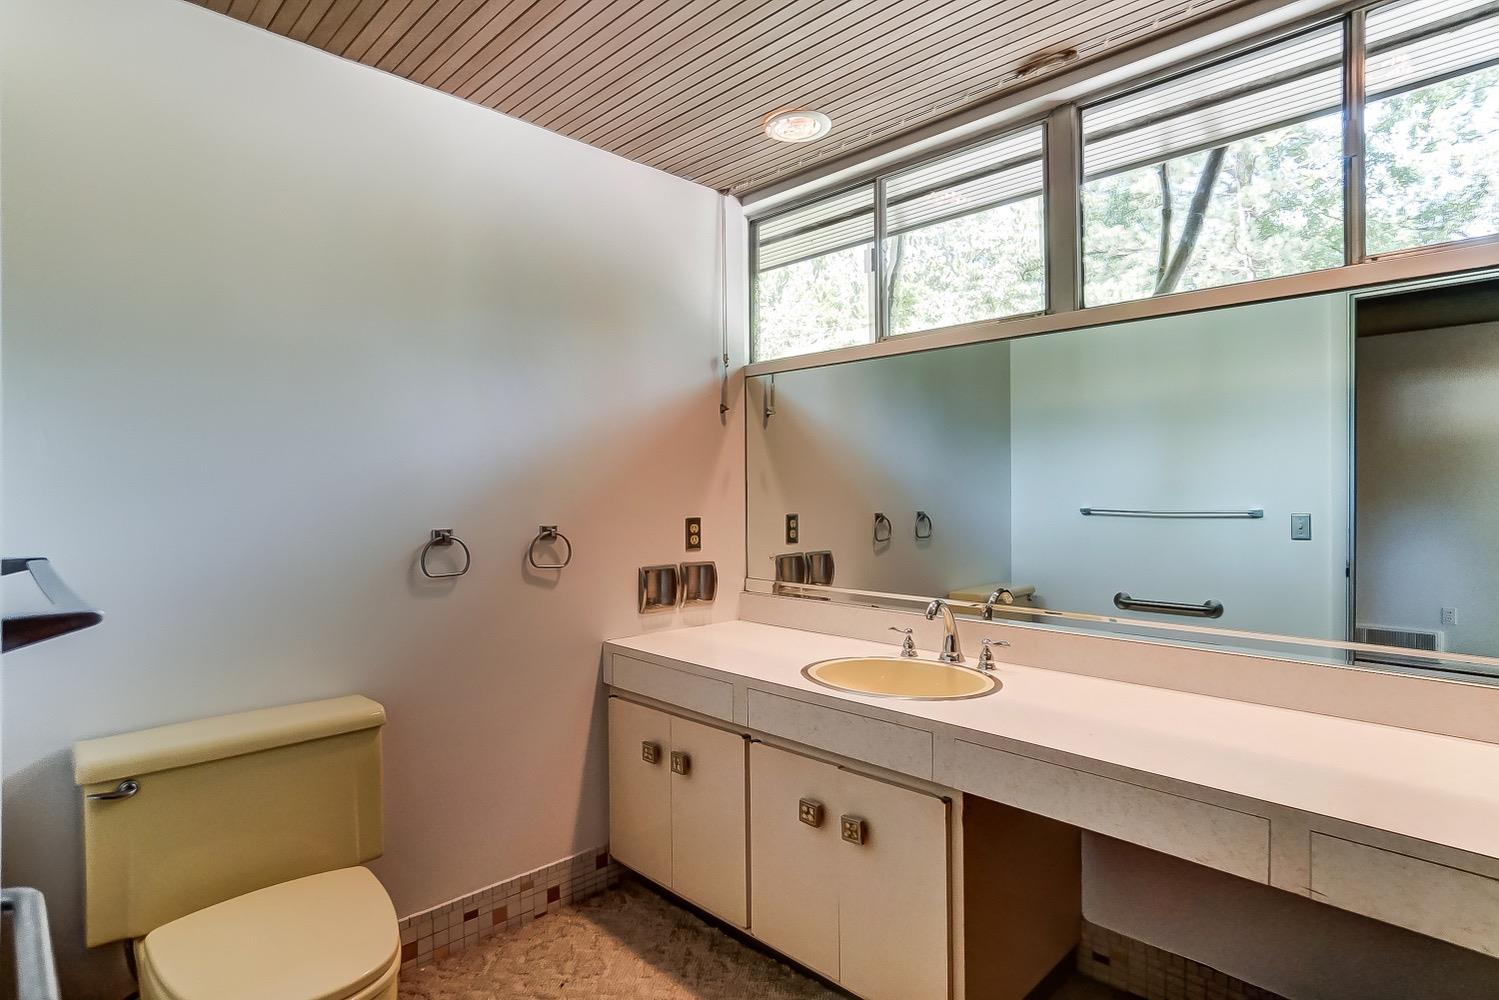 Main level half bath. All original vintage custom vanity, hardware and more of the resin cabinet door knobs.